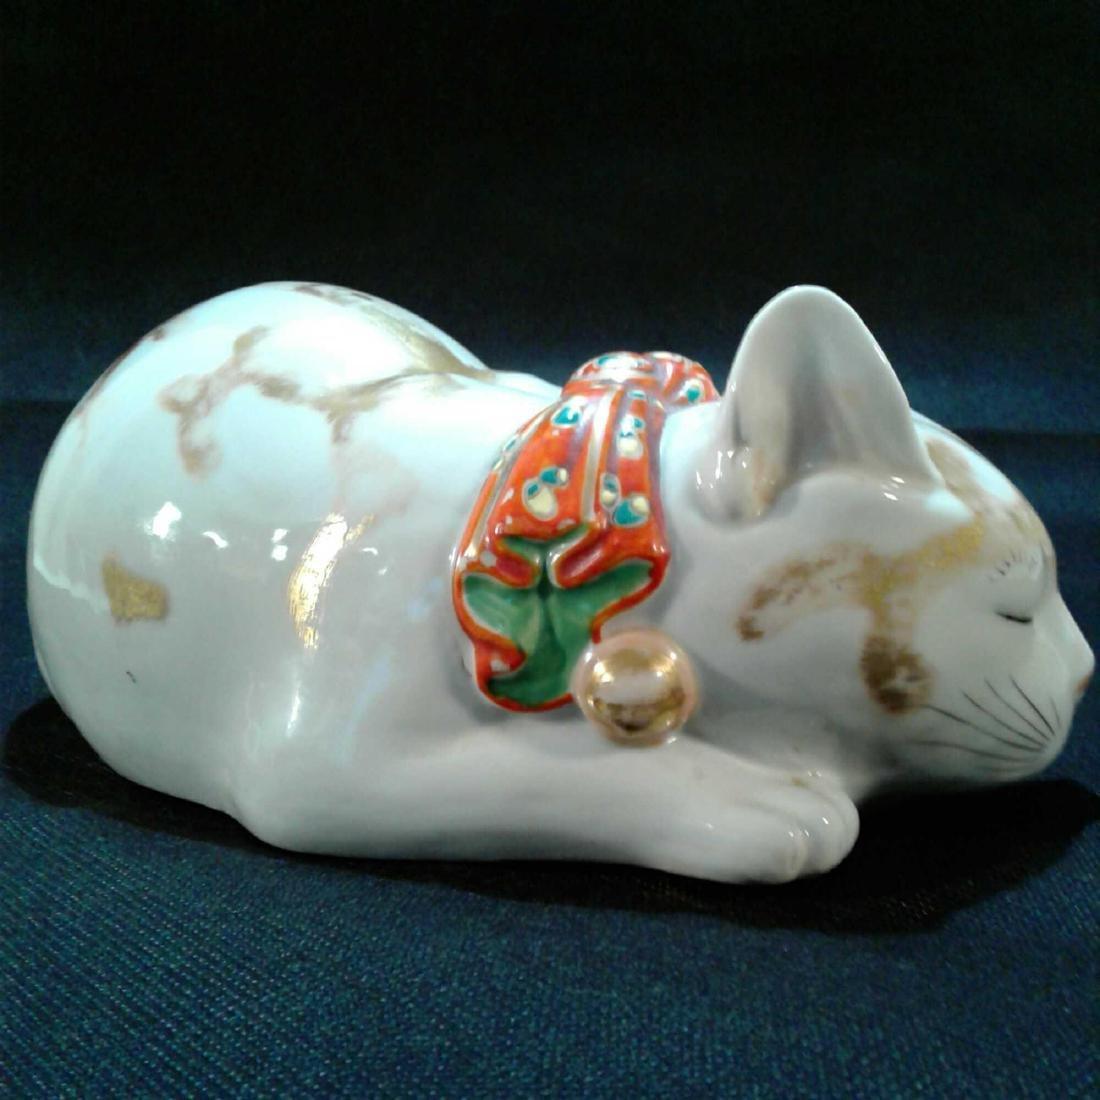 Japanese Kutani Sleeping Cat Porcelain Figure - 4